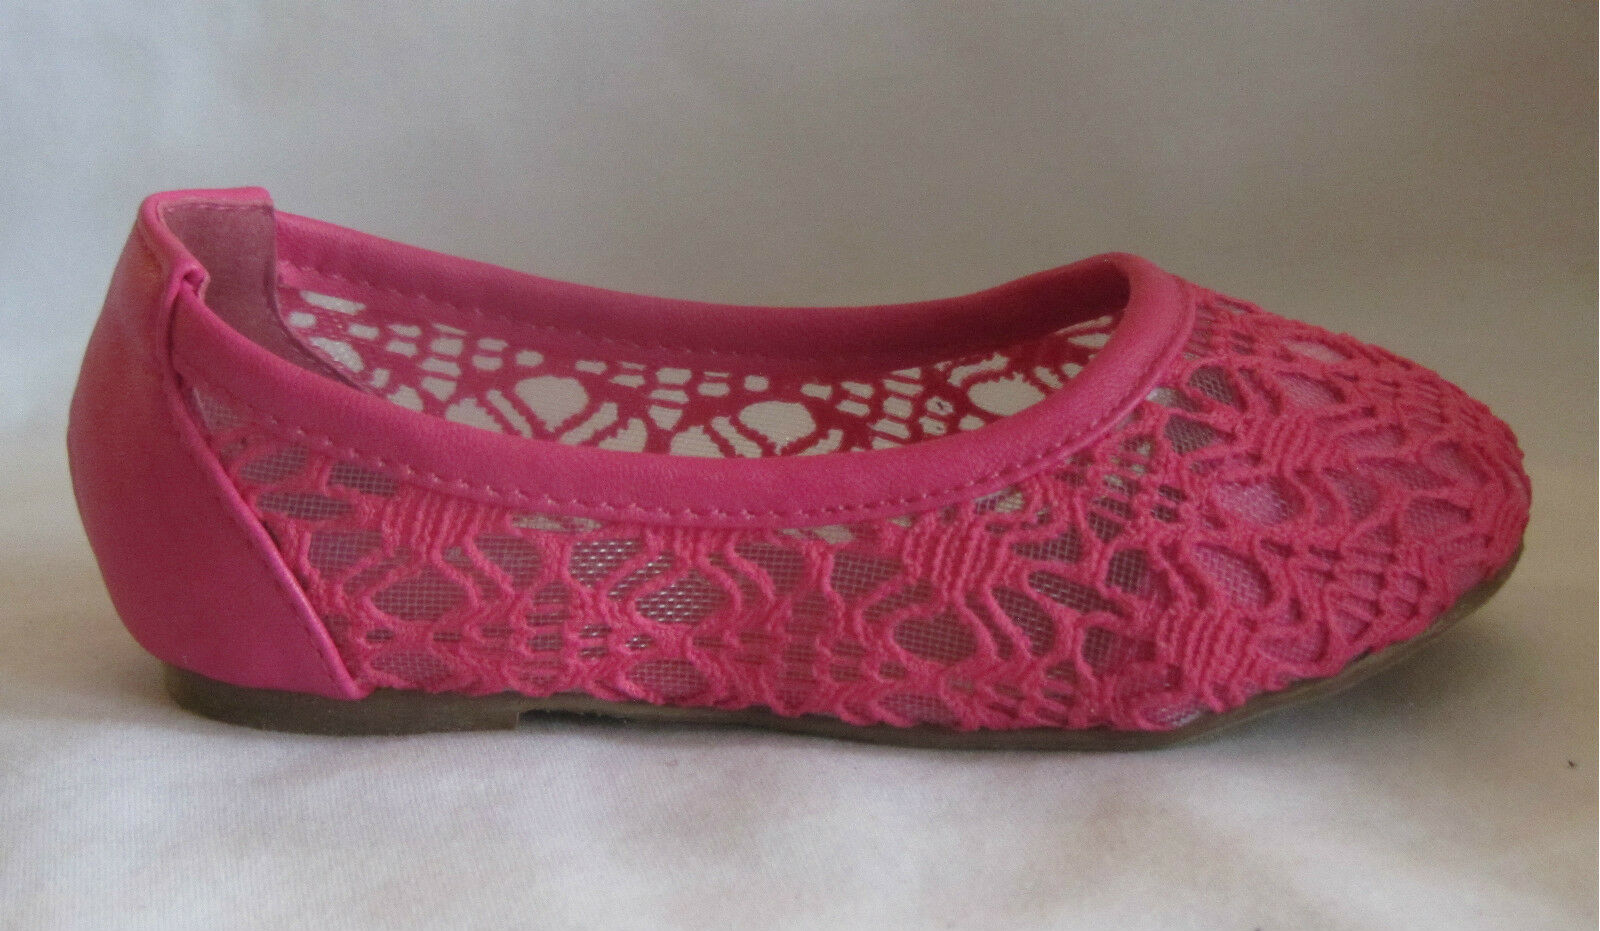 Girls Flats Lacey Spot3a Toddler Flower Girl Pageant Dress Shoes